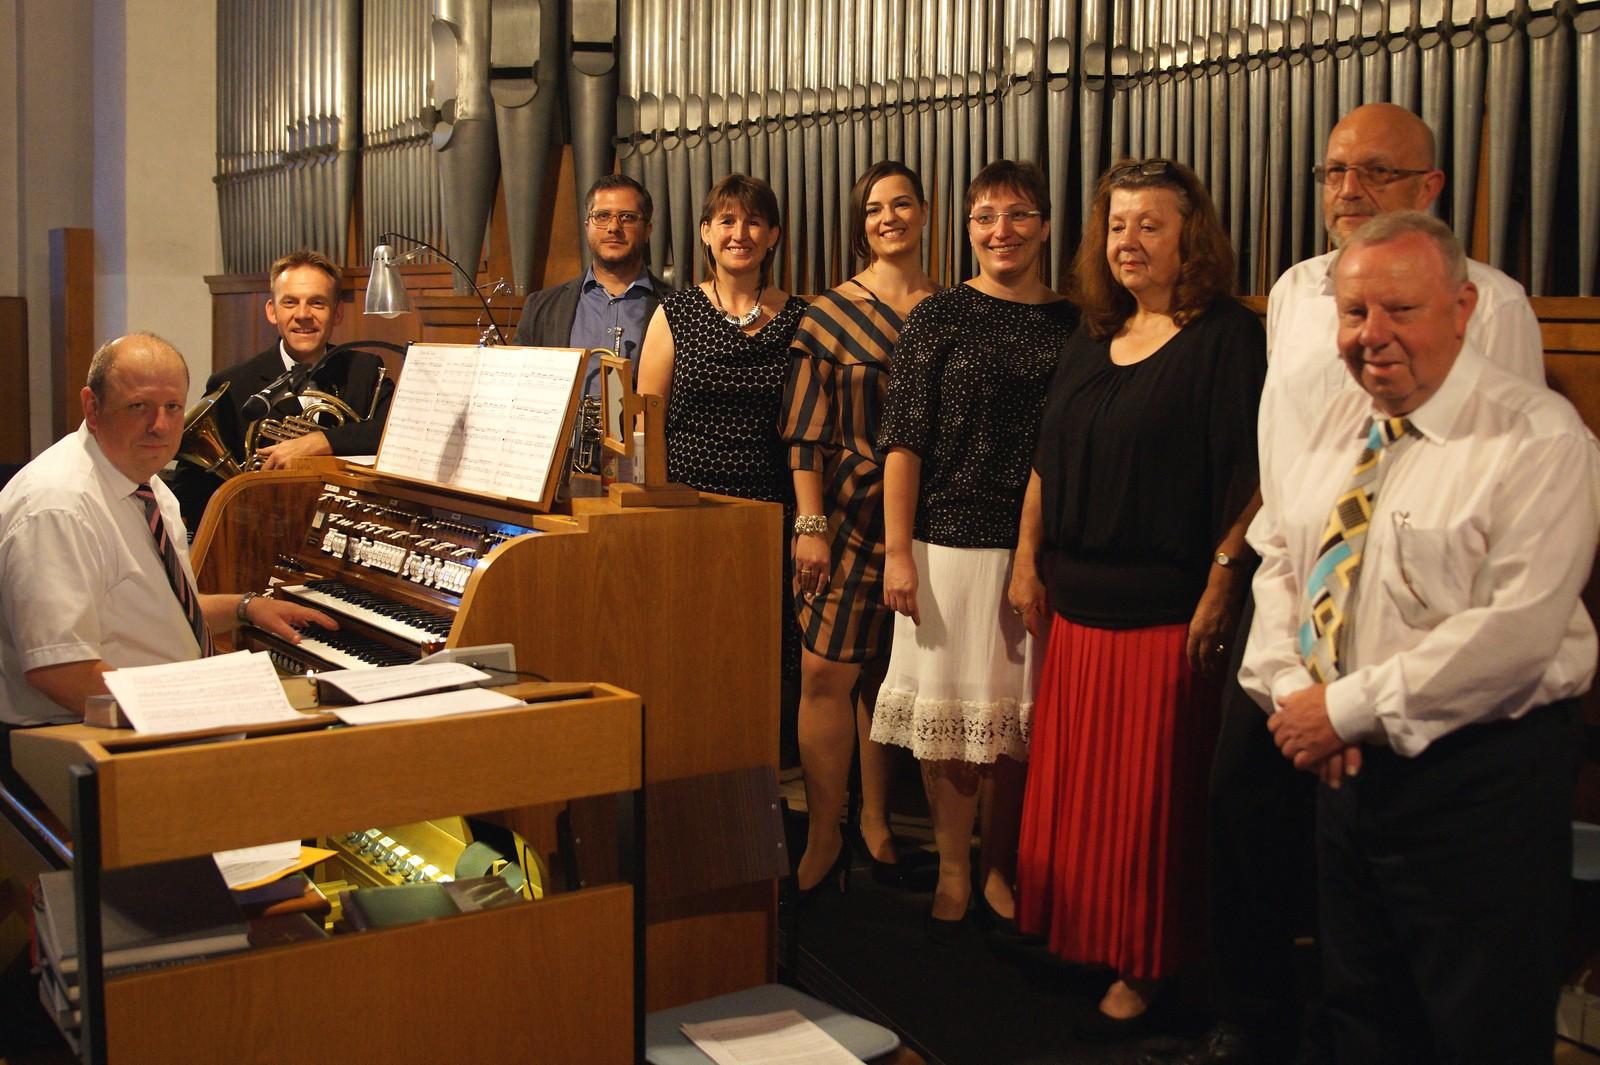 20180815-Konzert Patrozinium Maria Himmelfahrt DSC02609